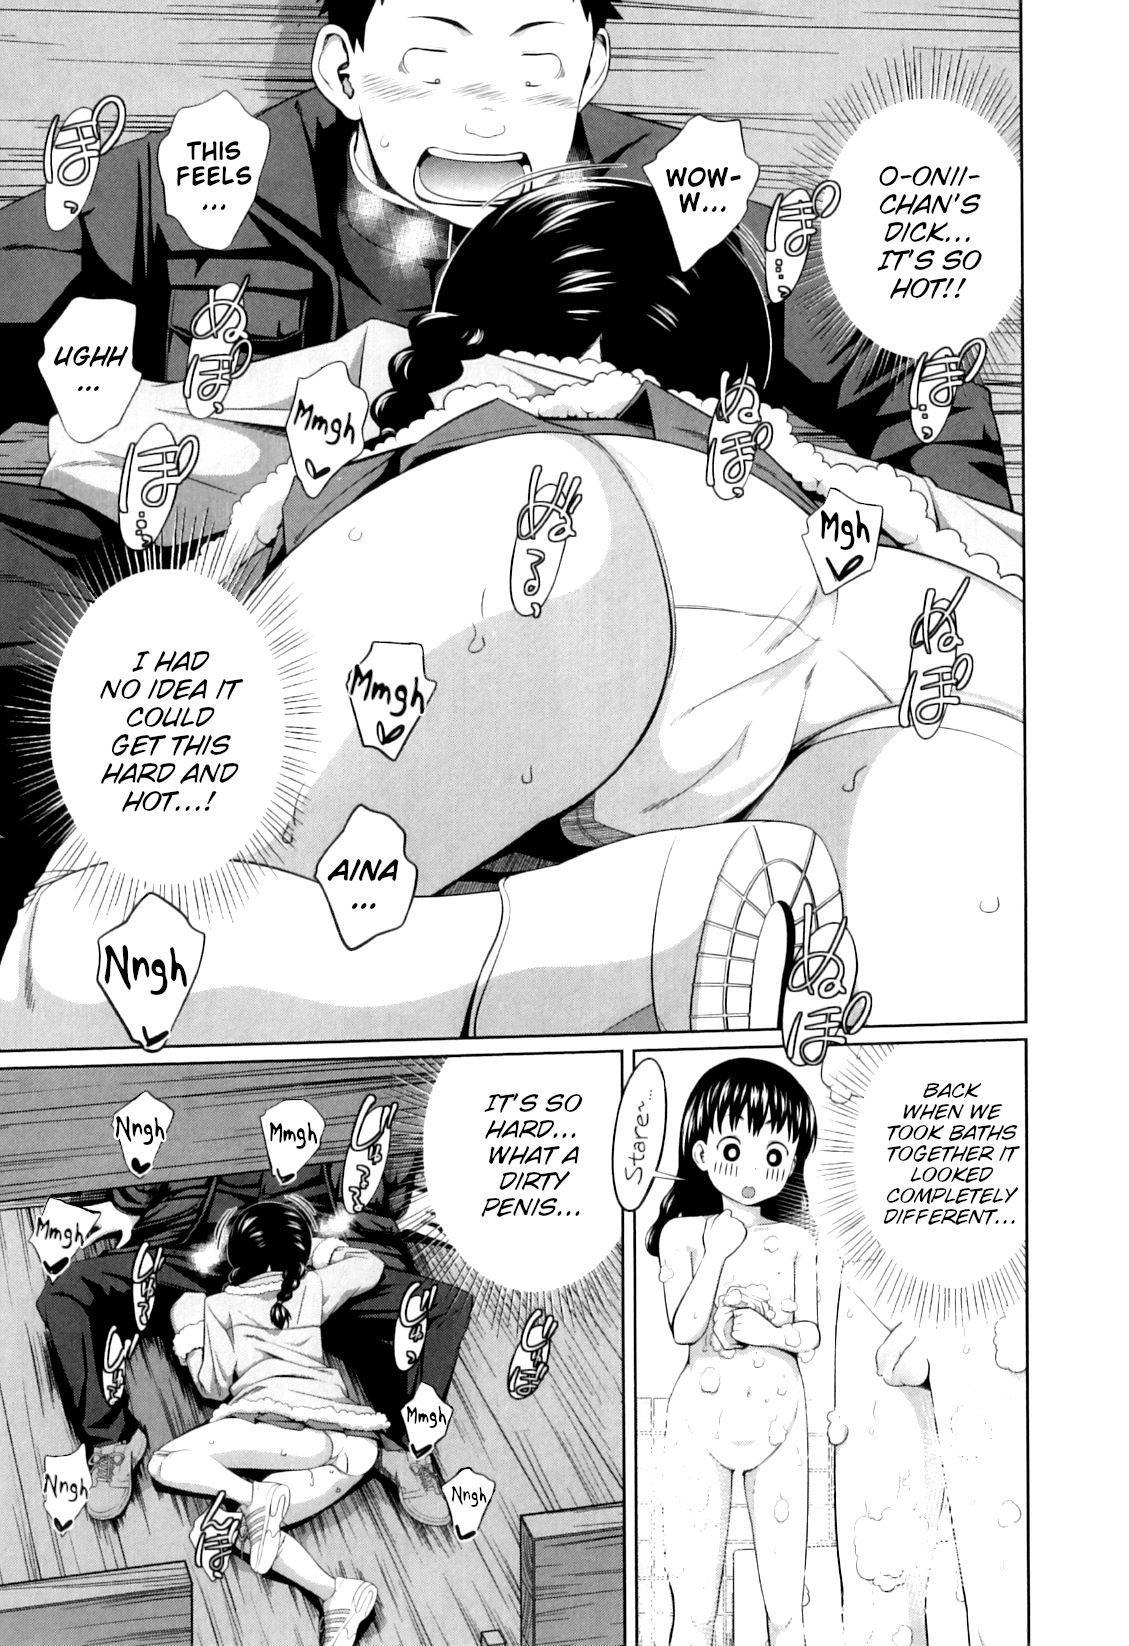 [Tsubaki Jushirou] Onii-chan no Kuse ni Namaiki nanda mon! | Onii-chan is such a bully! (My Mai Secret) [English] [Mondee + Brook09] 14